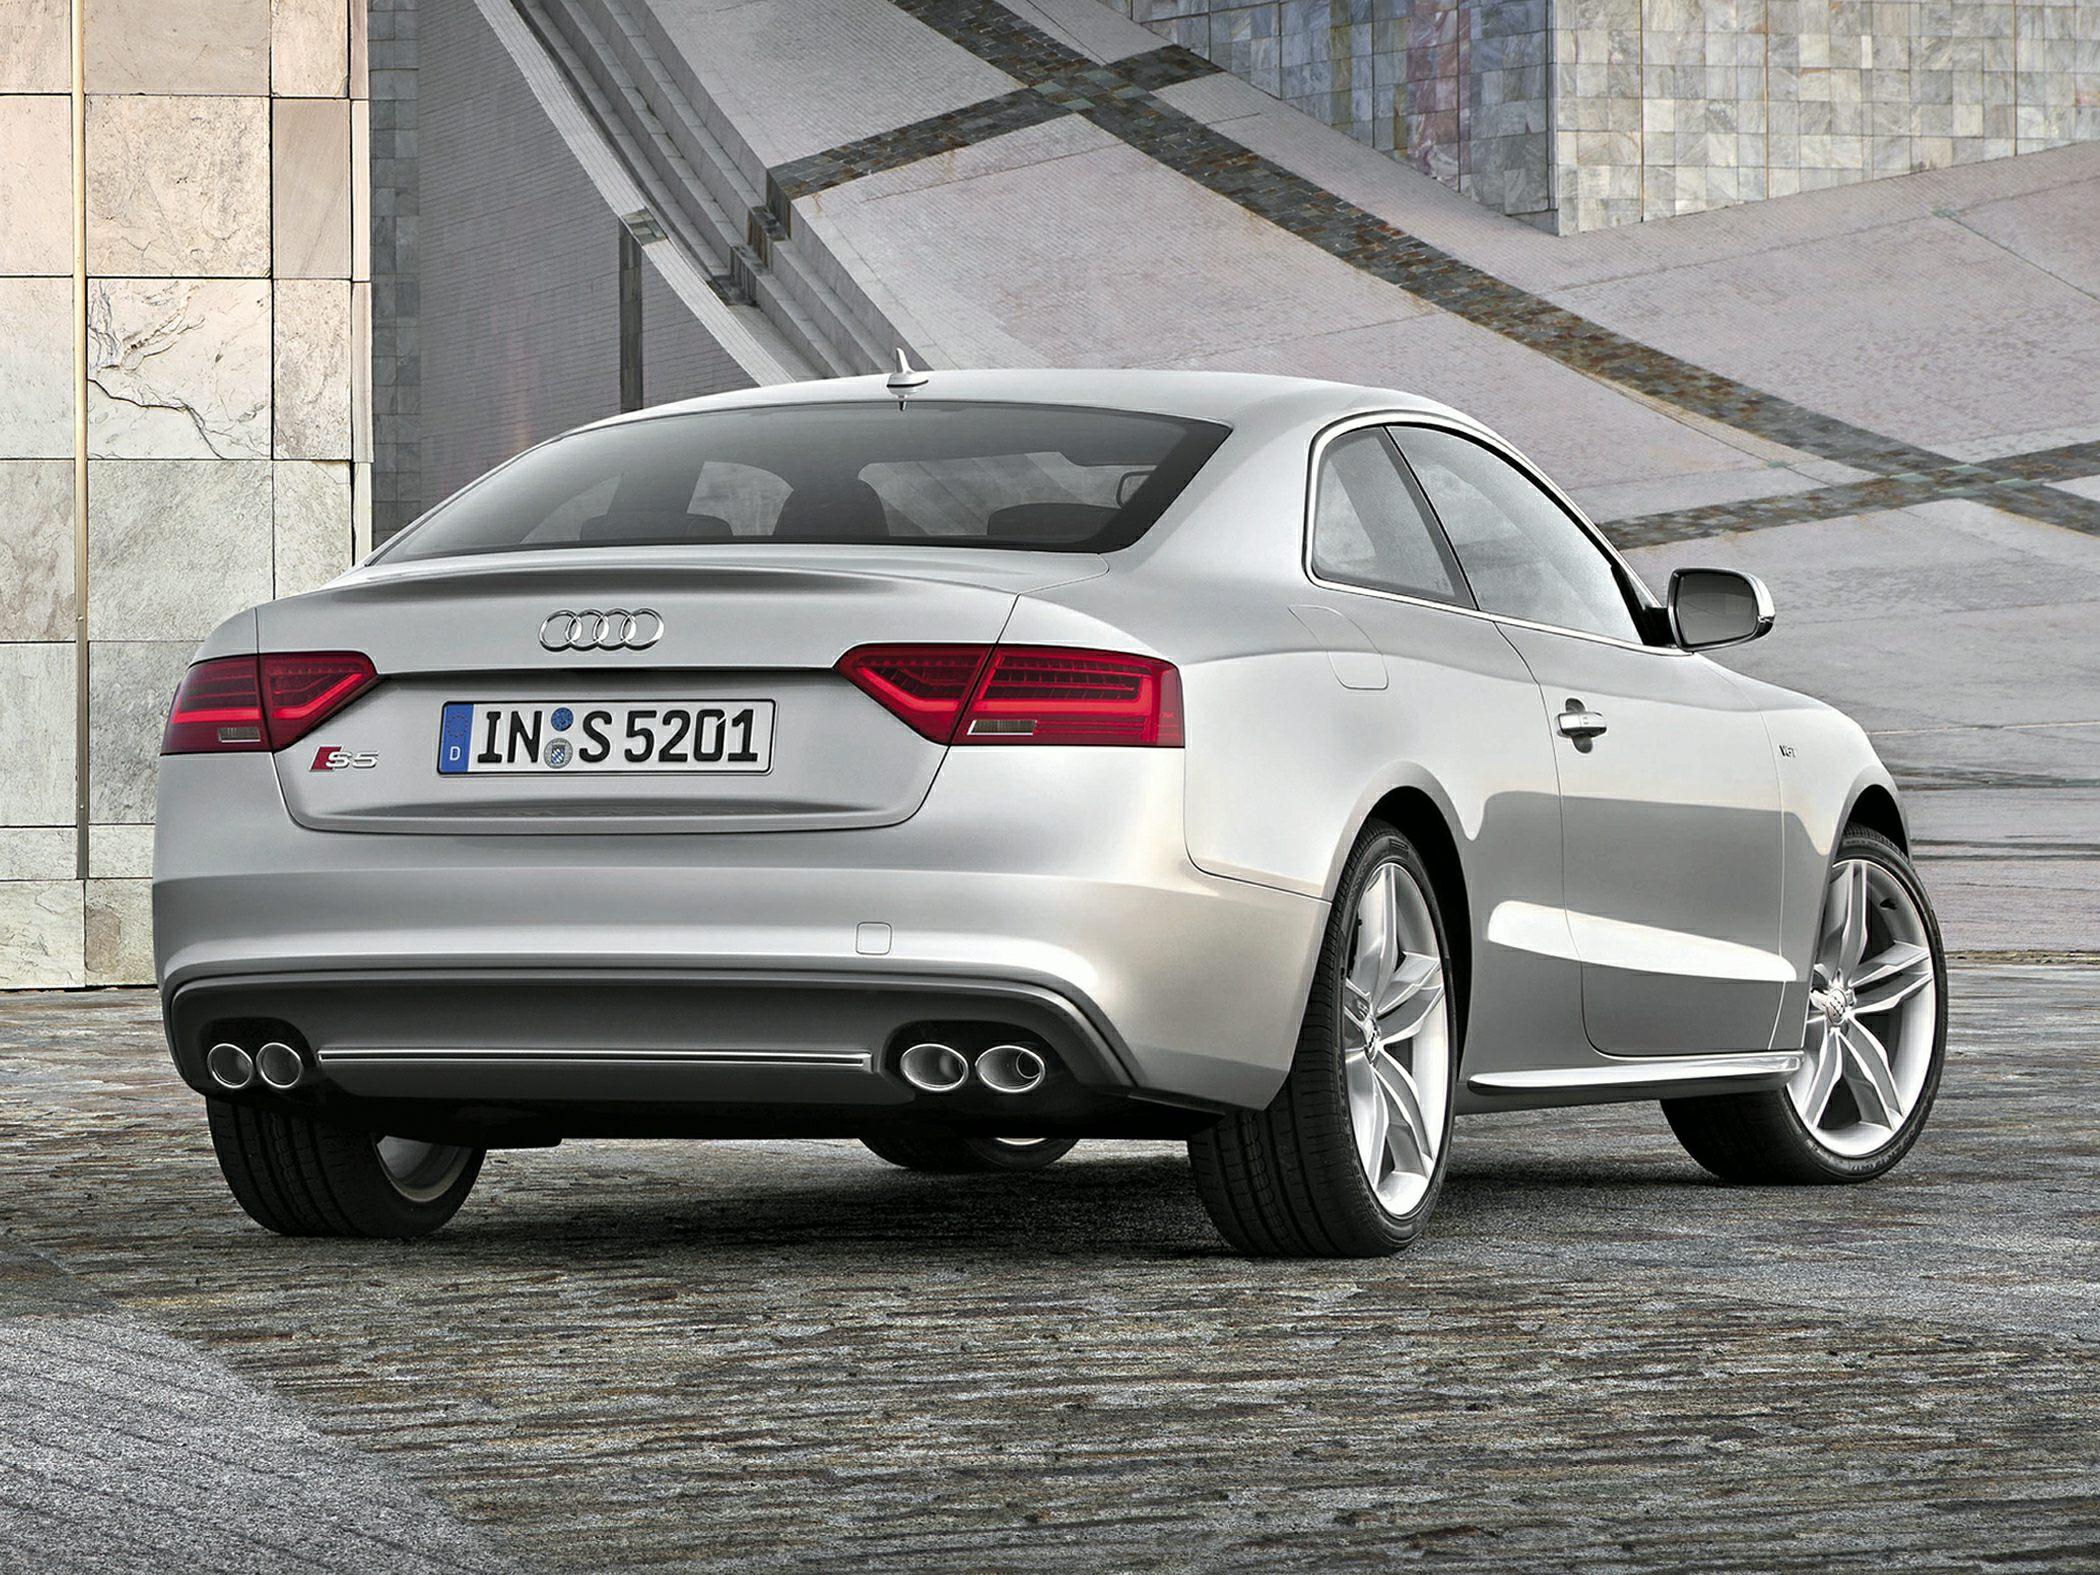 2015 Audi S5 Rear